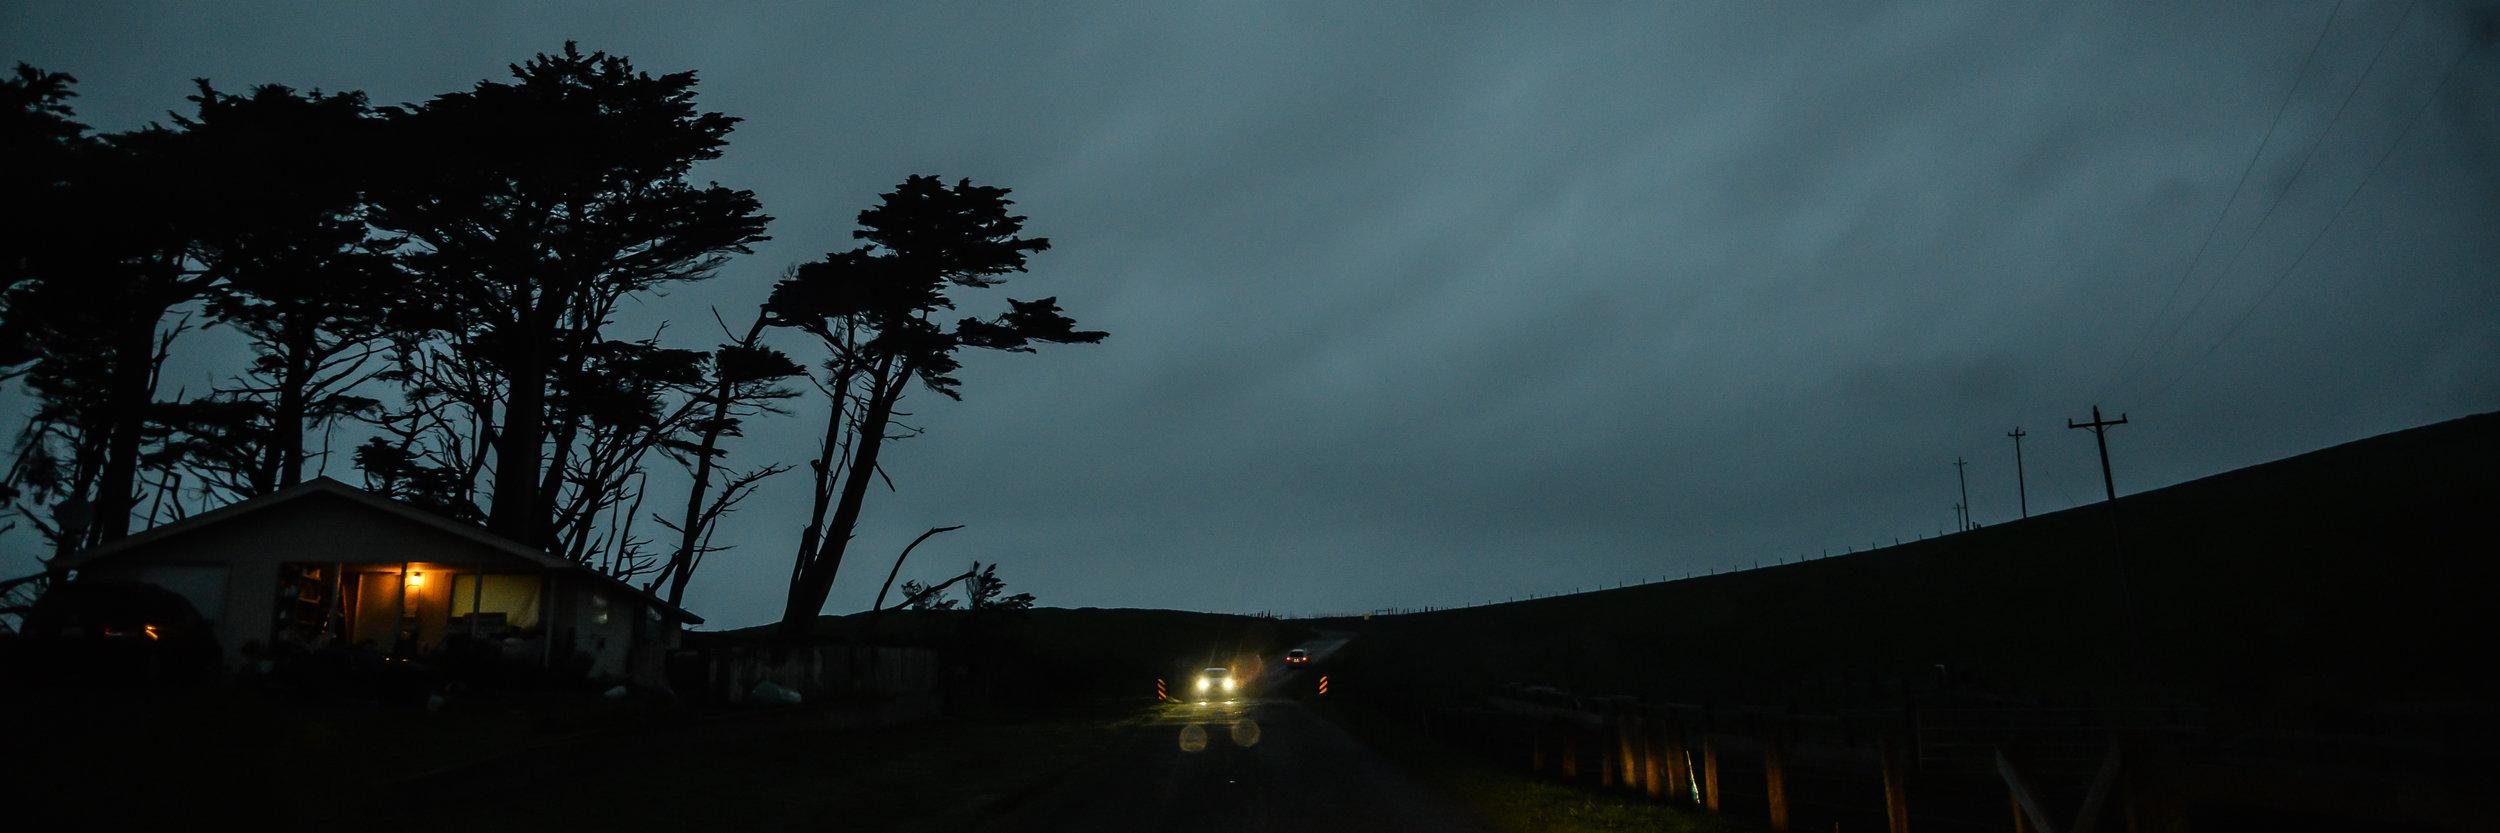 Headlights-bday-6dd-6539.jpg